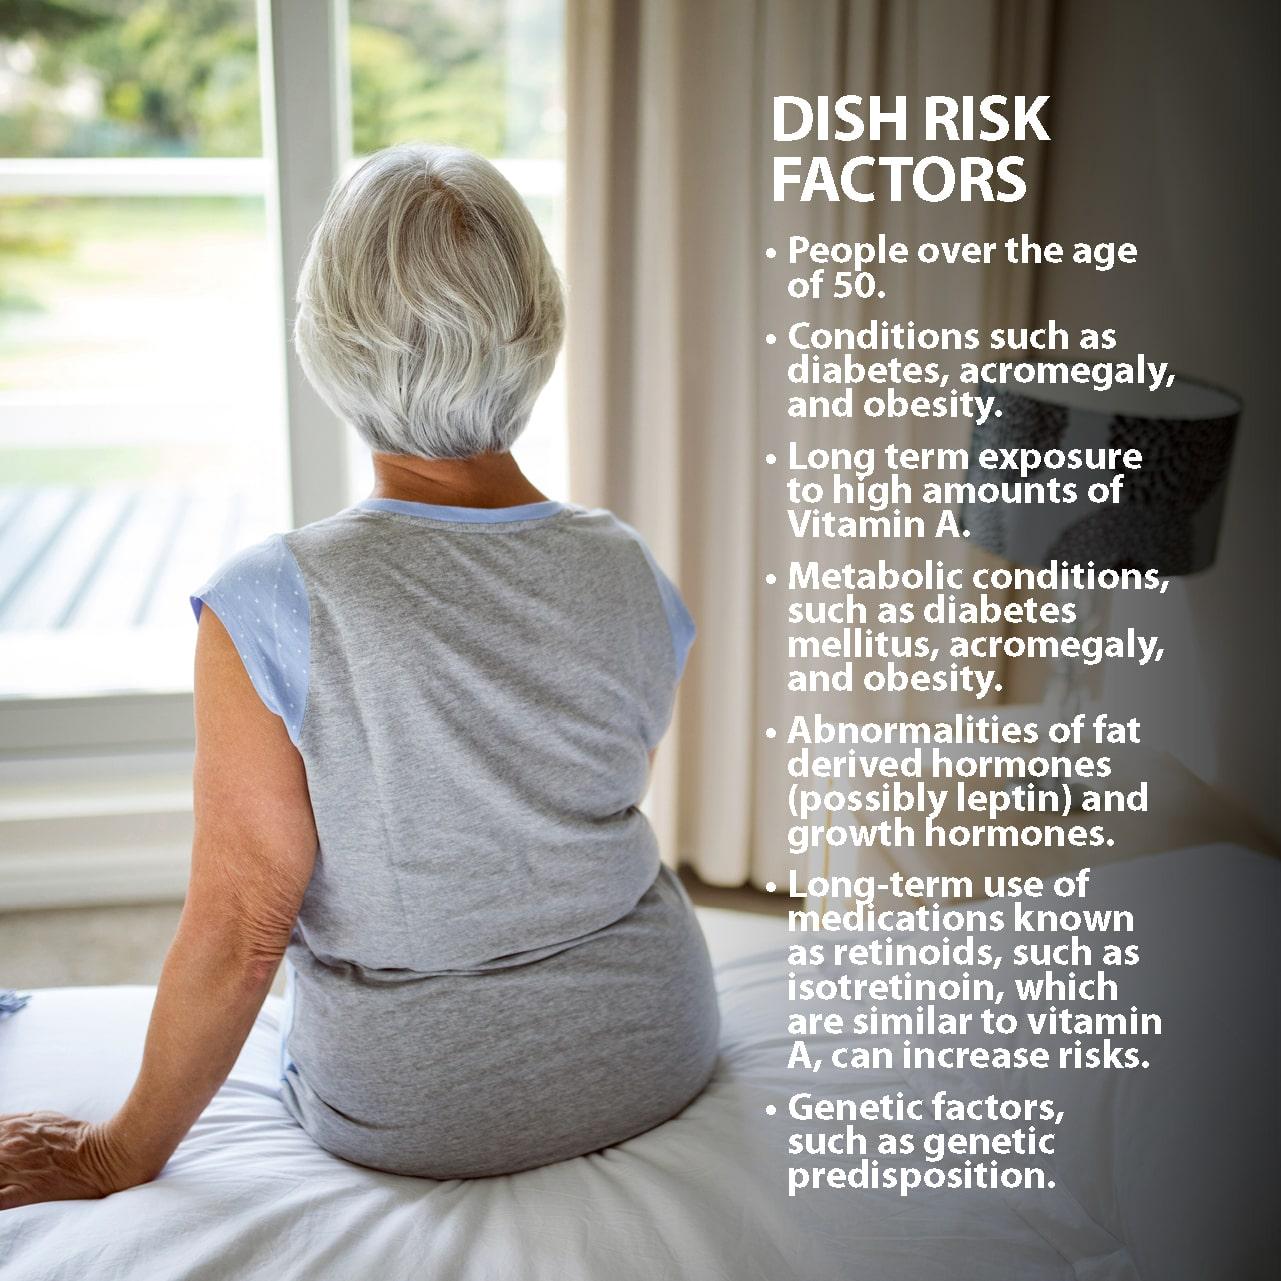 Diffuse Idiopathic Skeletal Hyperostosis Risk Factors